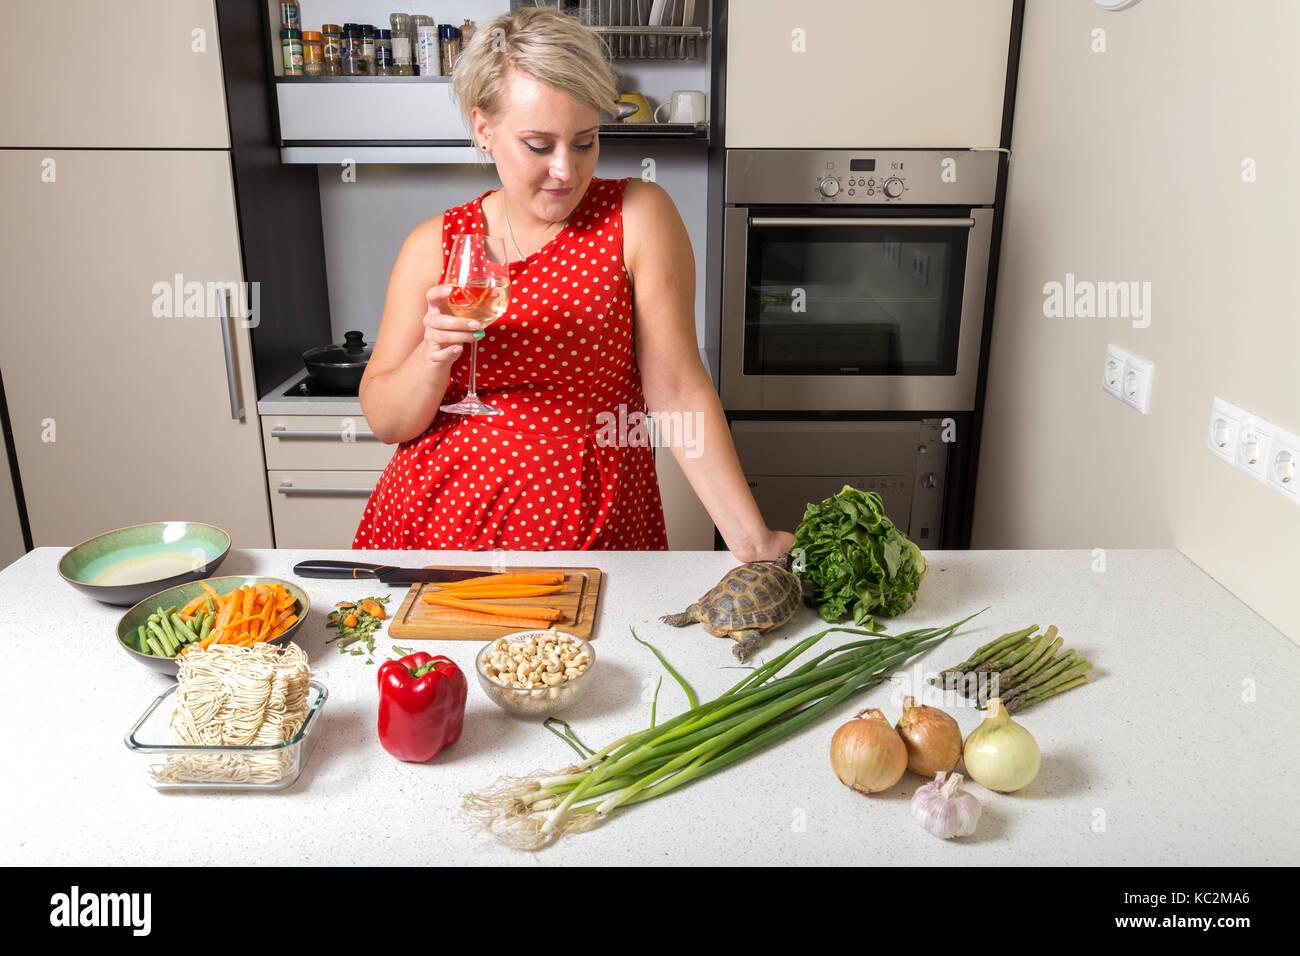 Woman observes tortoise eating on salad - Stock Image